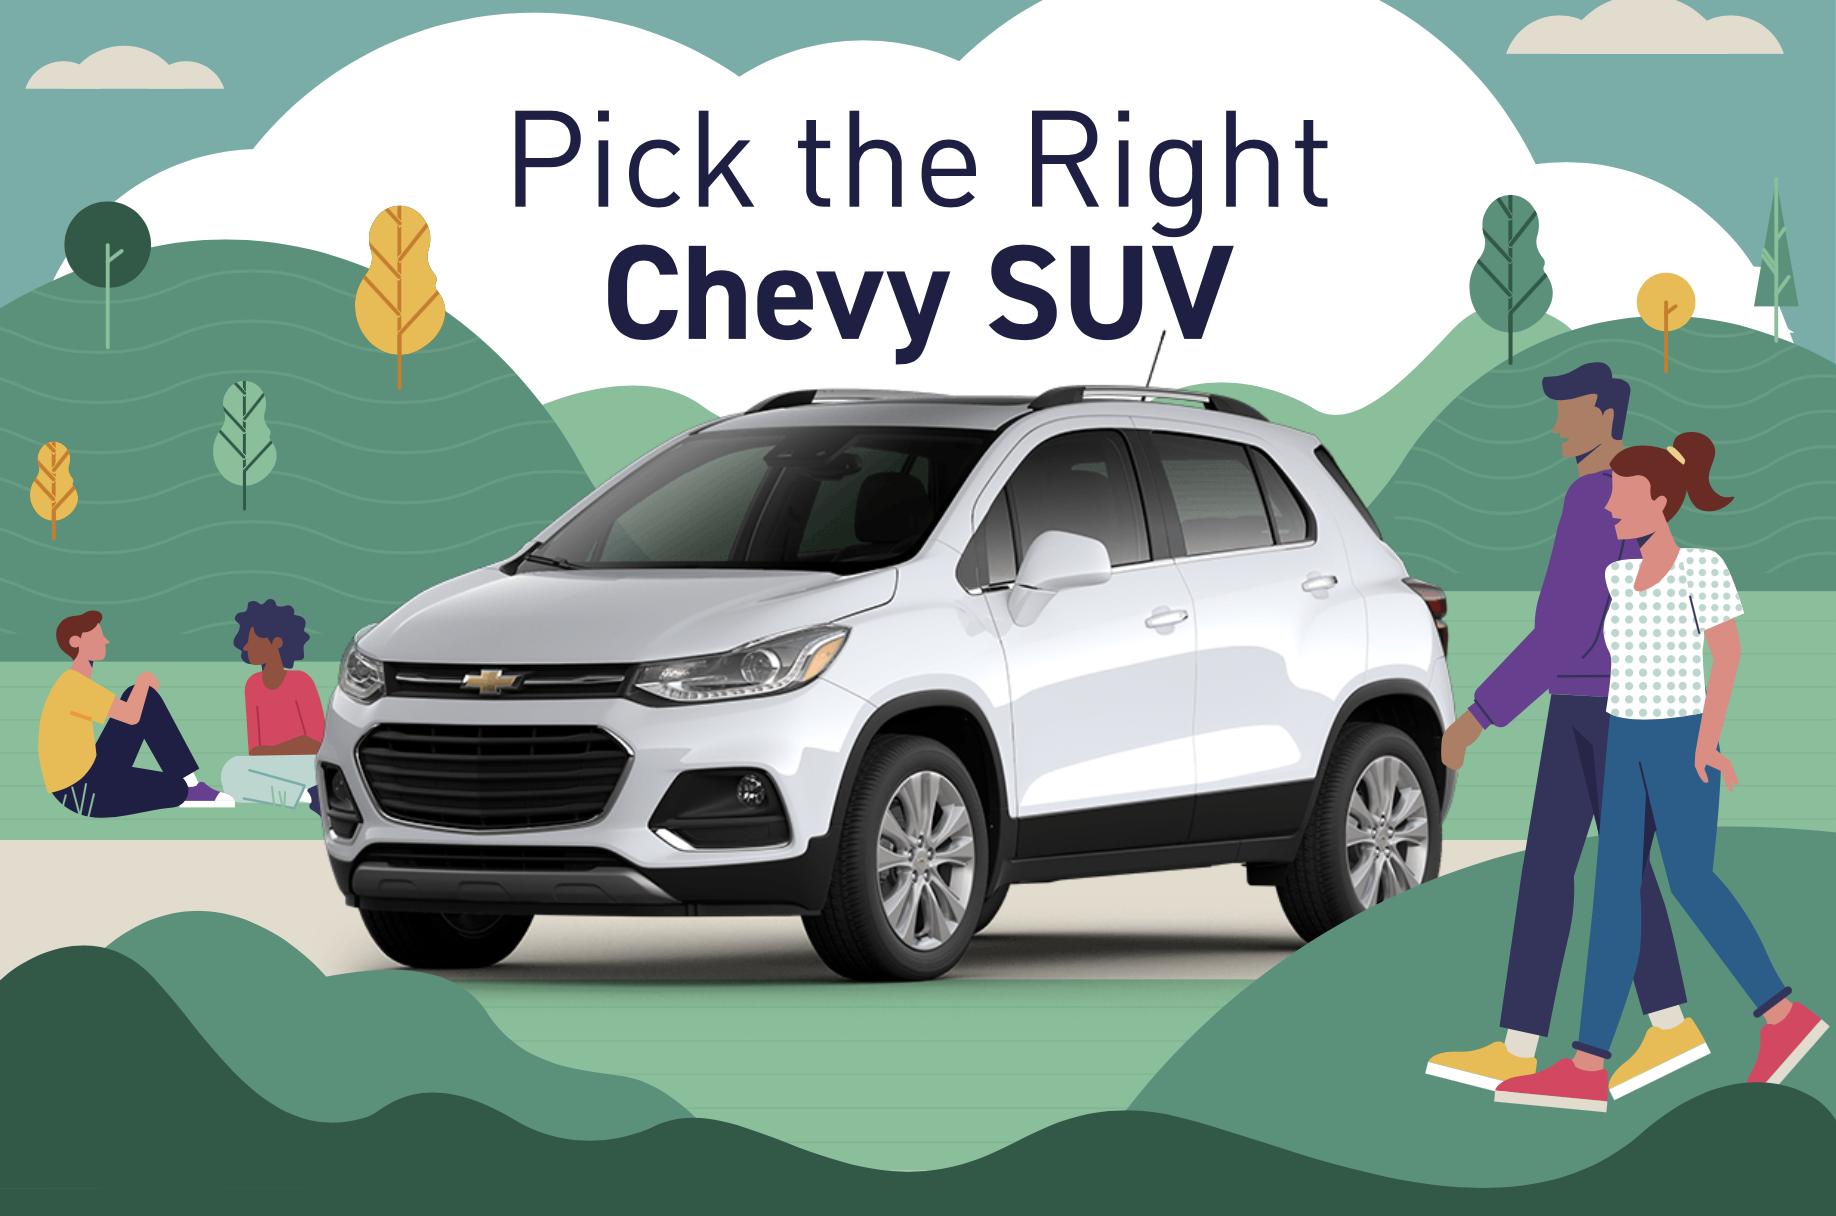 Pick the Right Chevy SUV Quiz